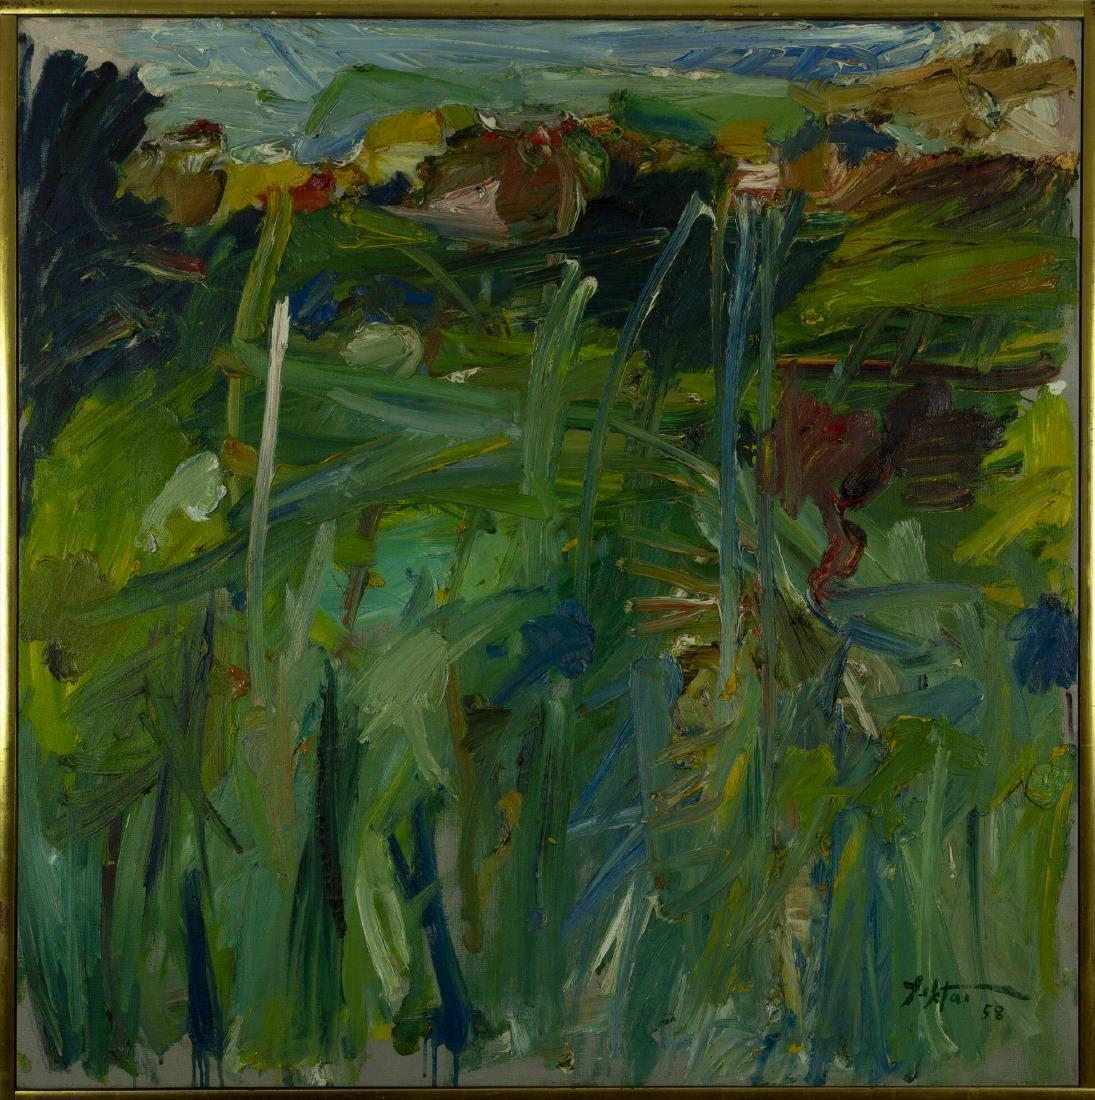 Manoucher Yektai - Positano Landscape (#3) (1958)